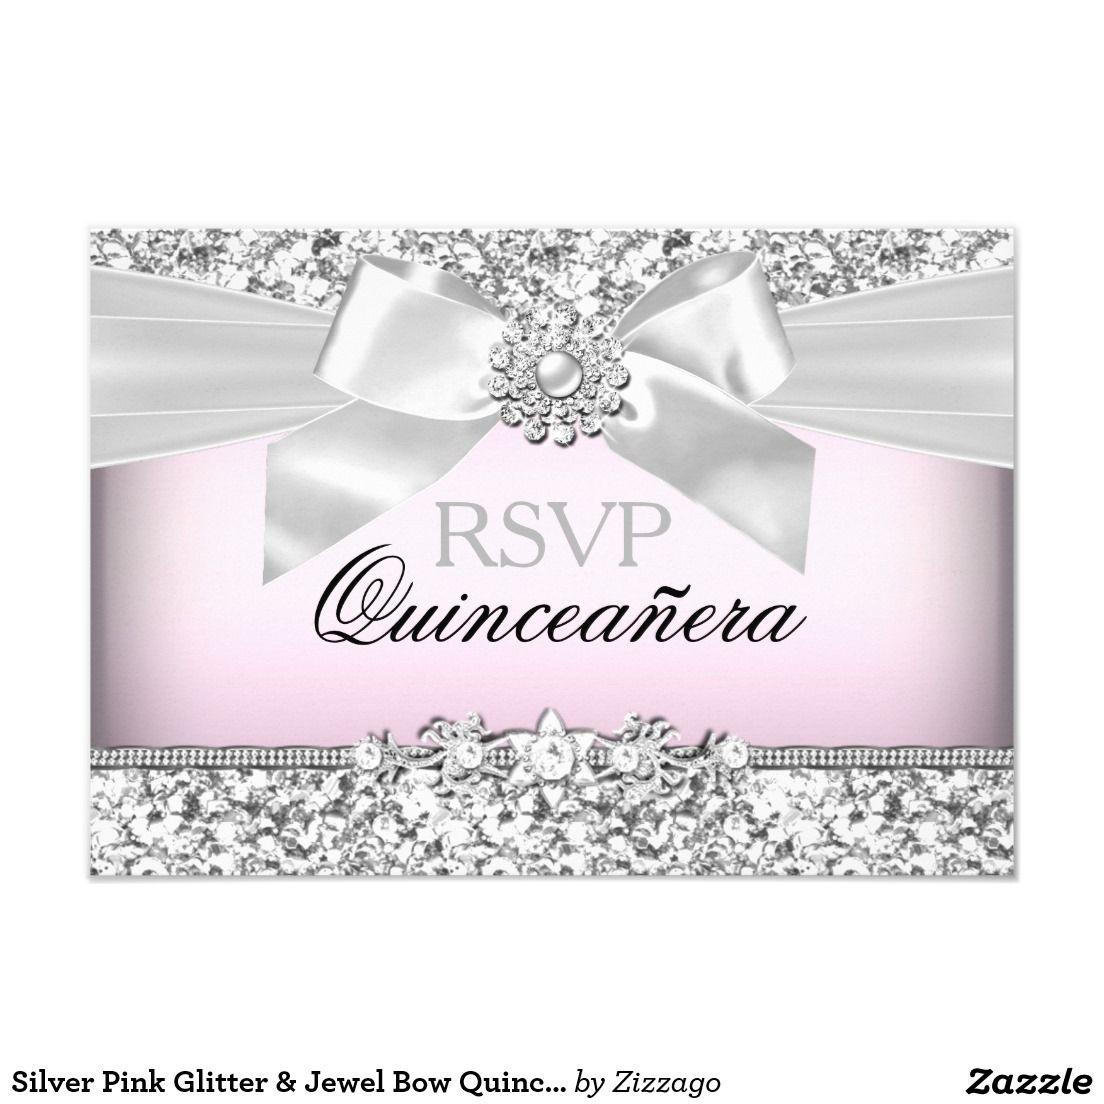 Silver Pink Glitter & Jewel Bow Quinceanera RSVP Card | Pink glitter ...